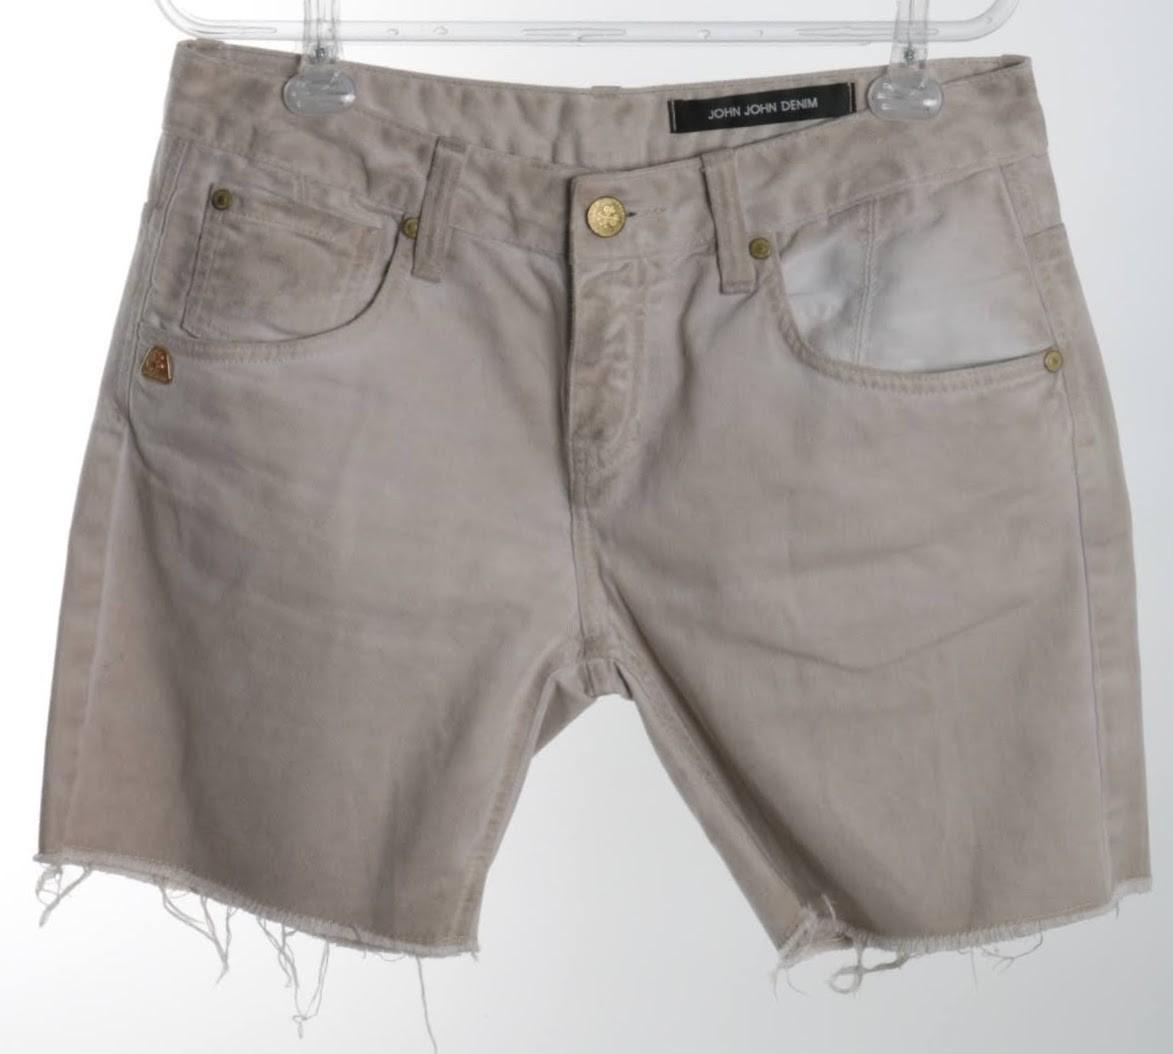 Shorts - John John - 40